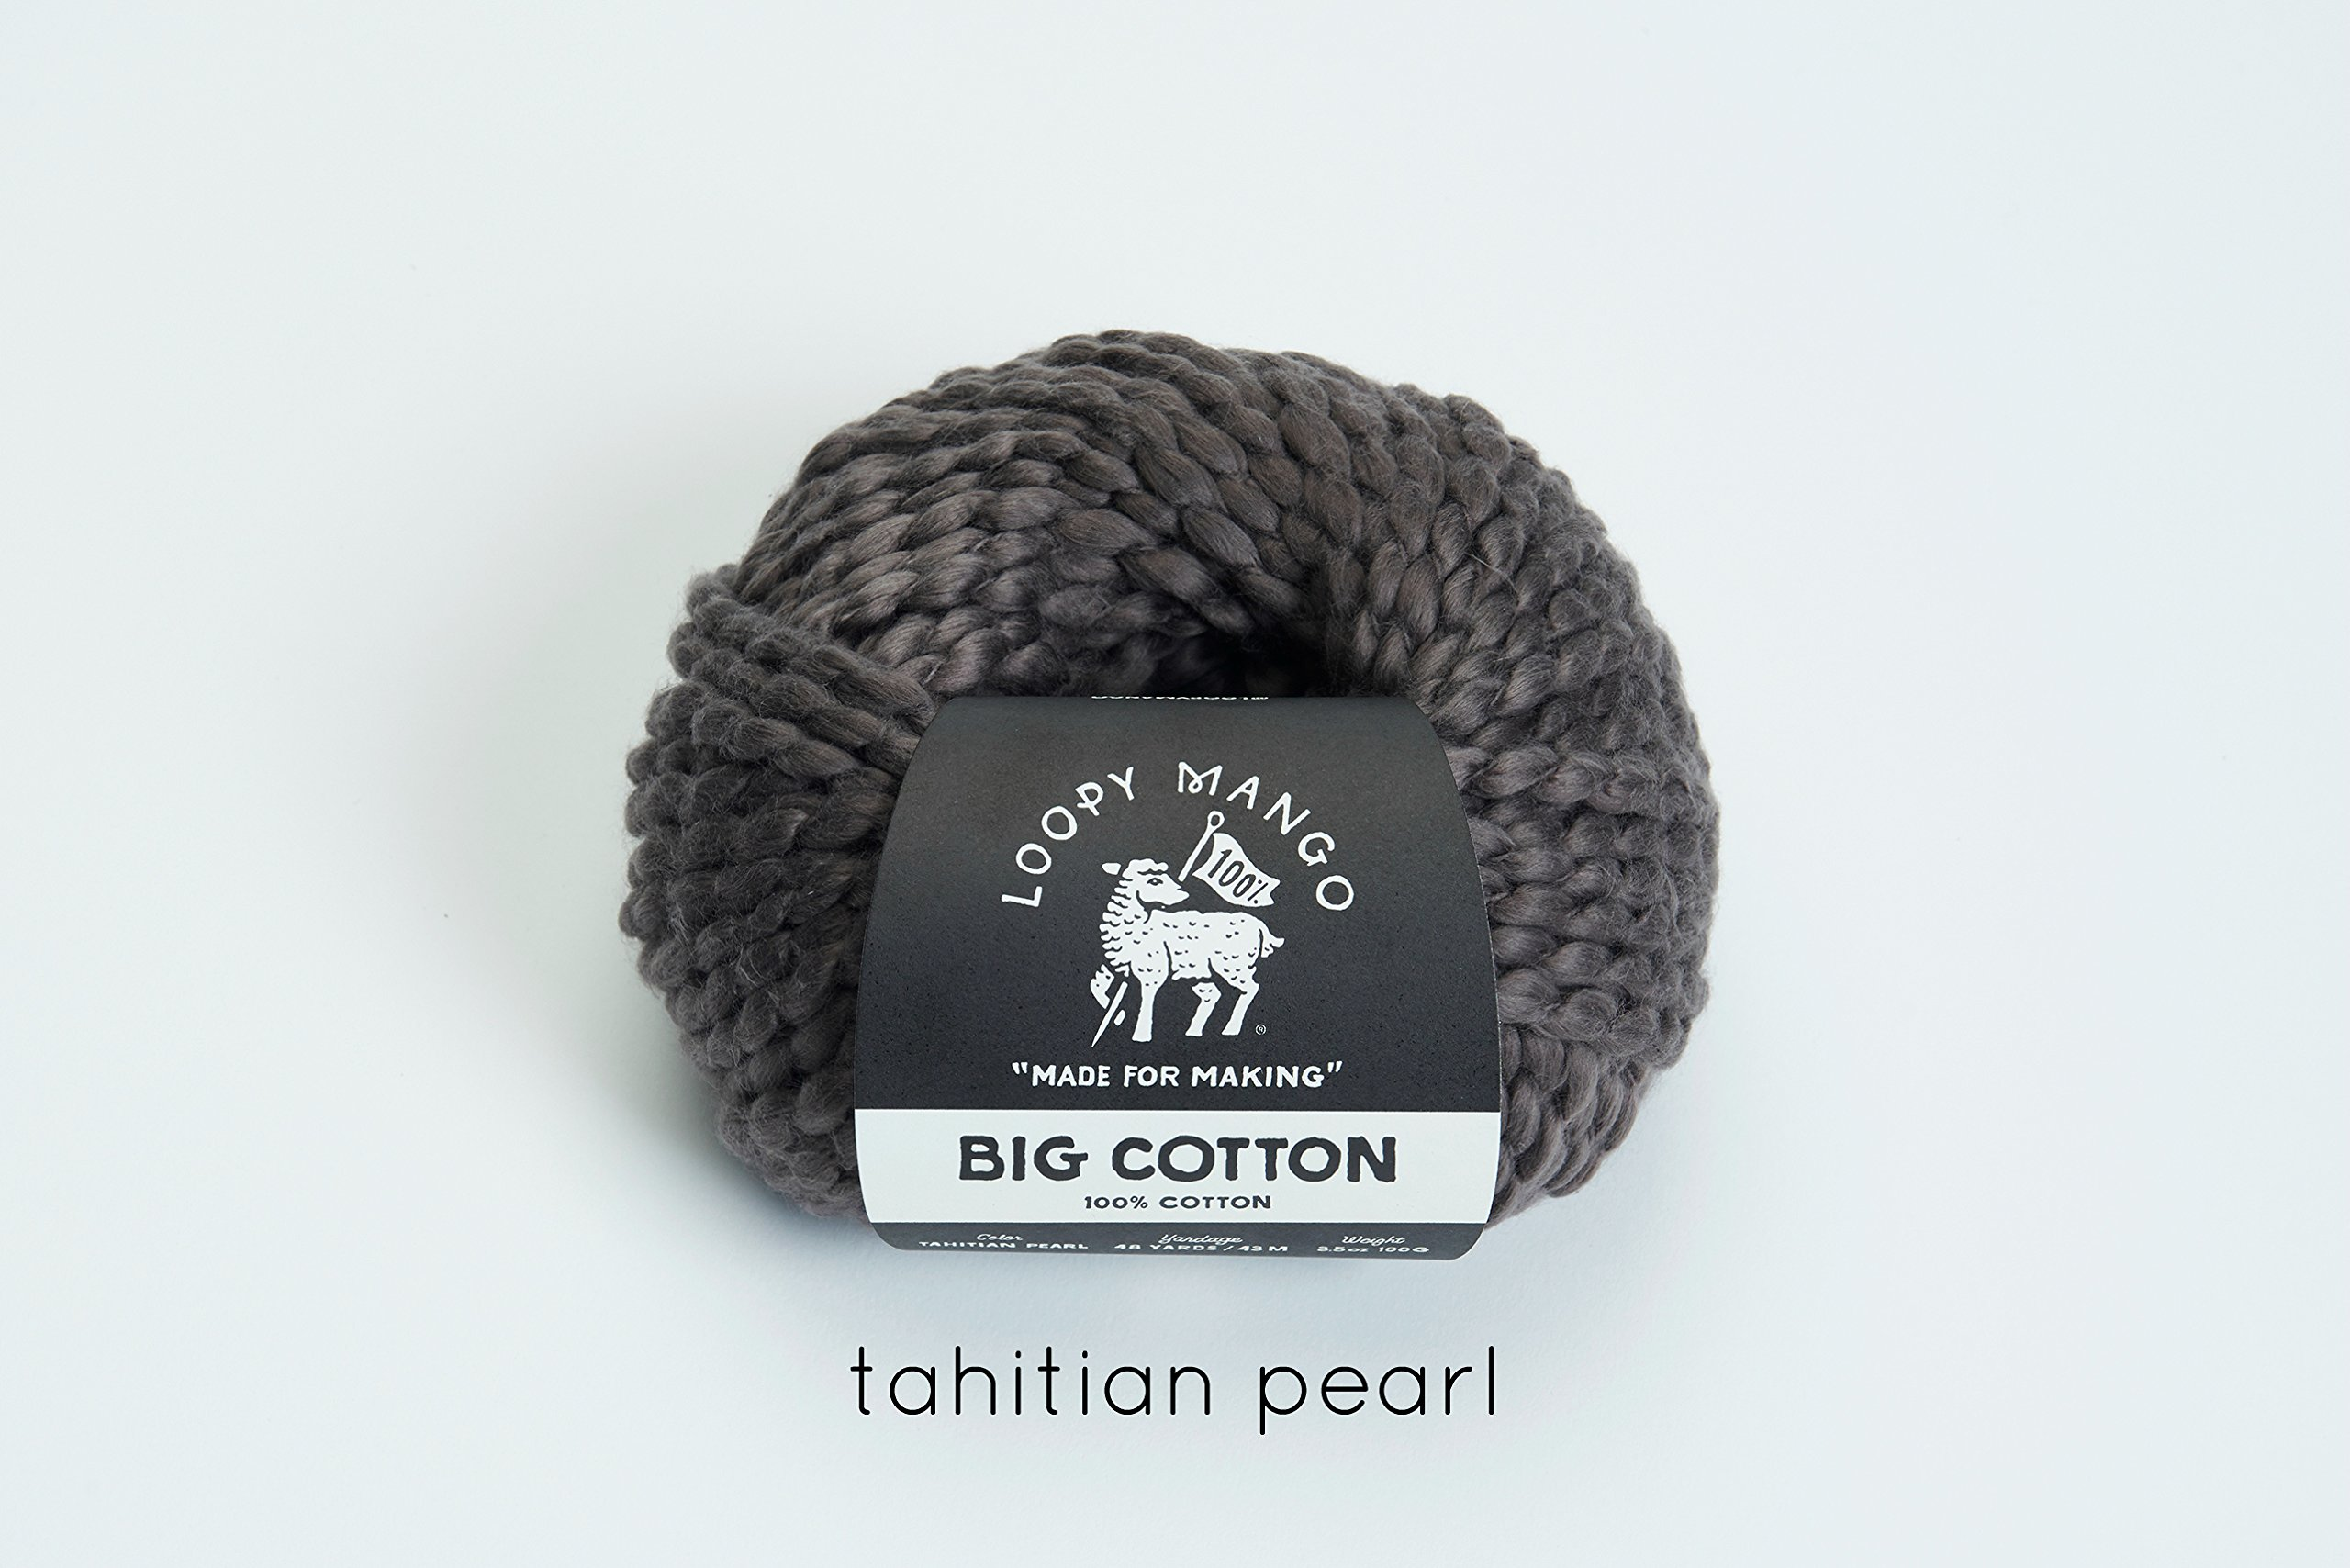 Loopy Mango DIY Kit - Cotton Baby Blanket-Tahitian Pearl by Loopy Mango (Image #6)